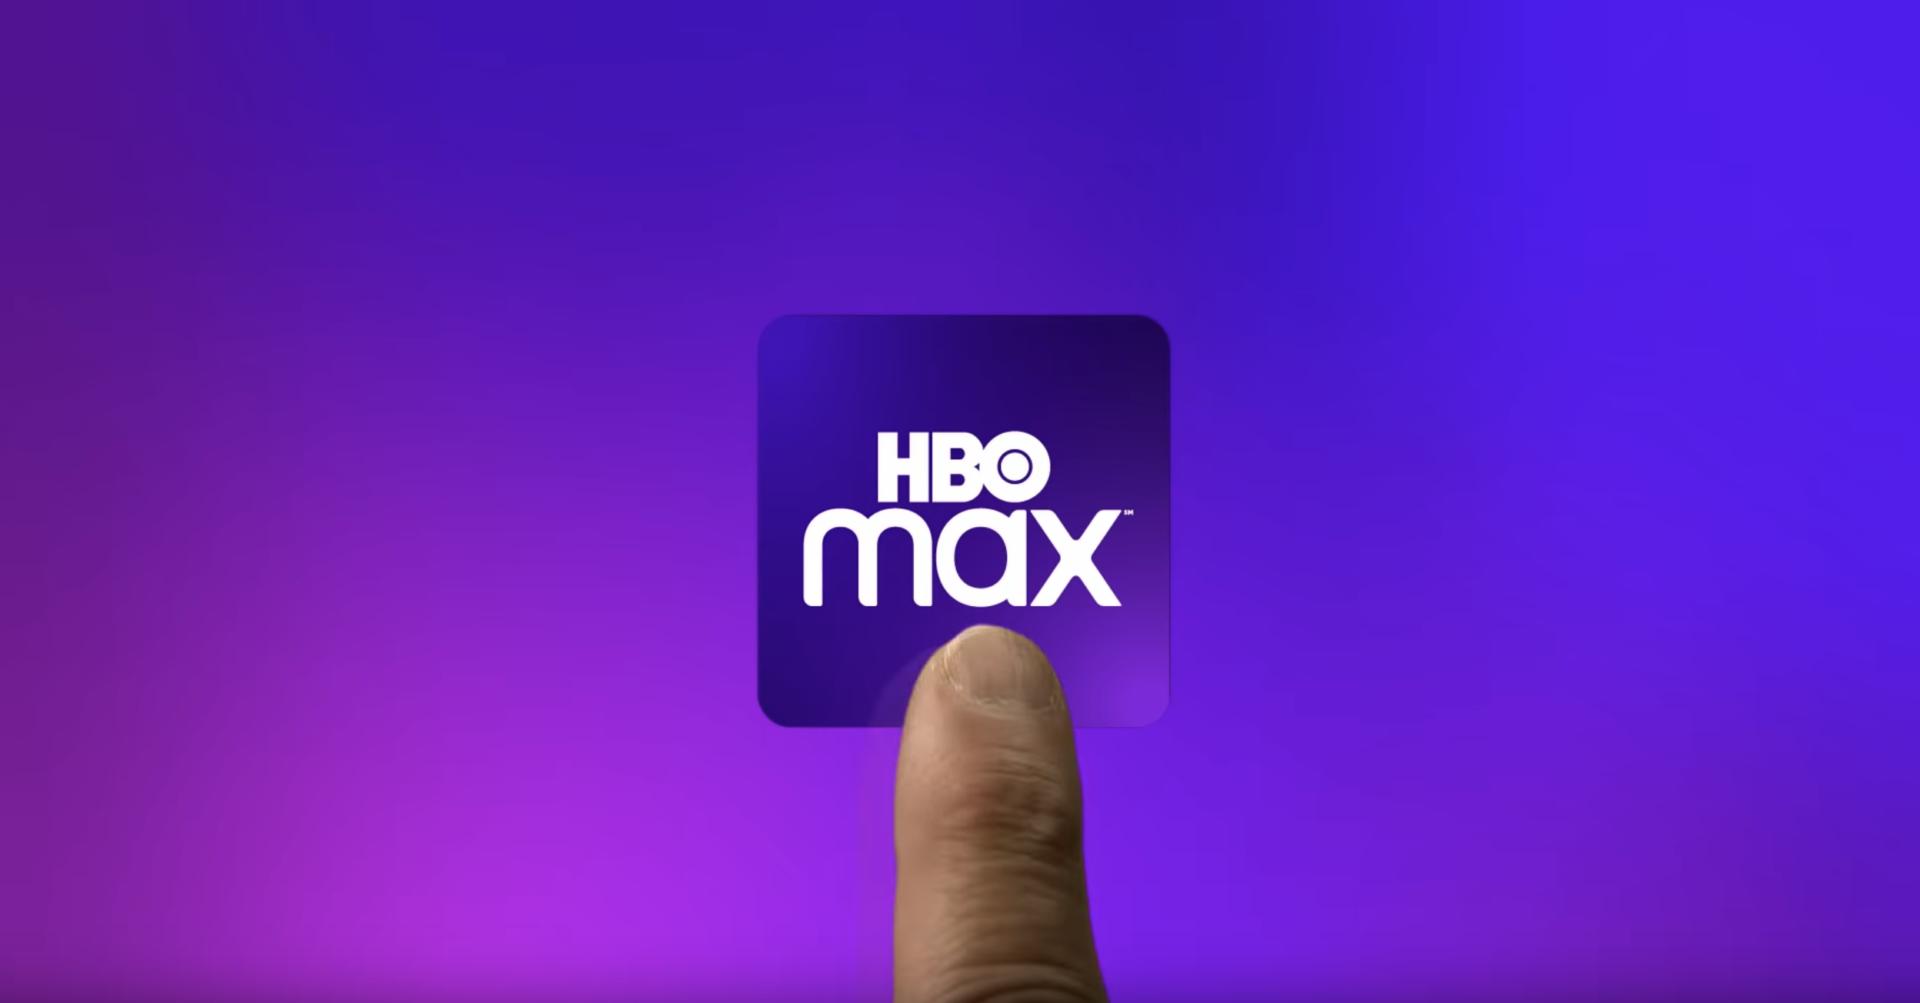 Ícone do HBO Max